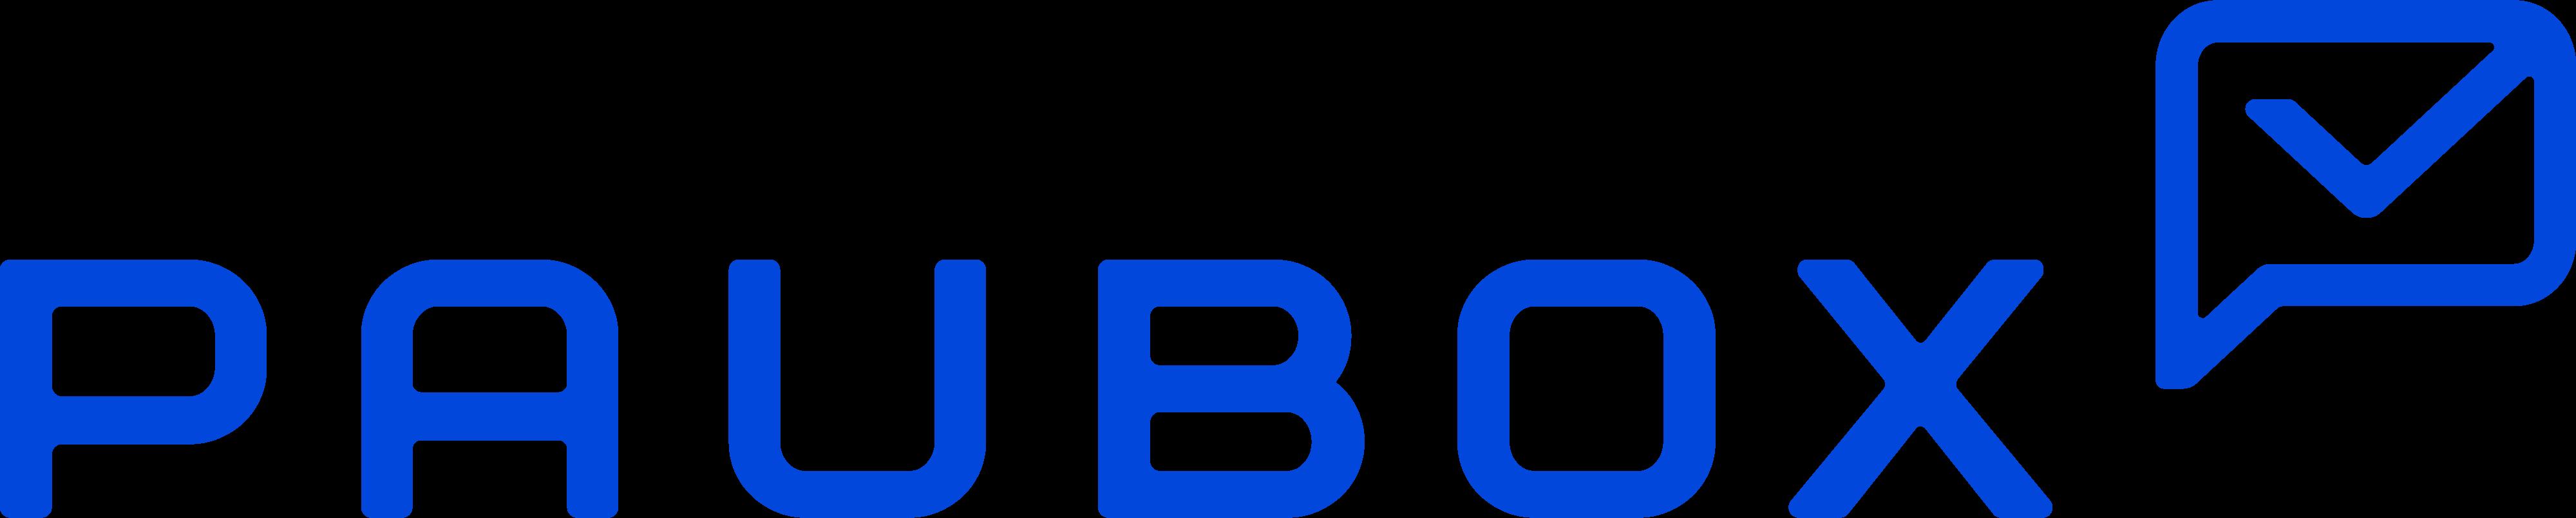 Paubox logo